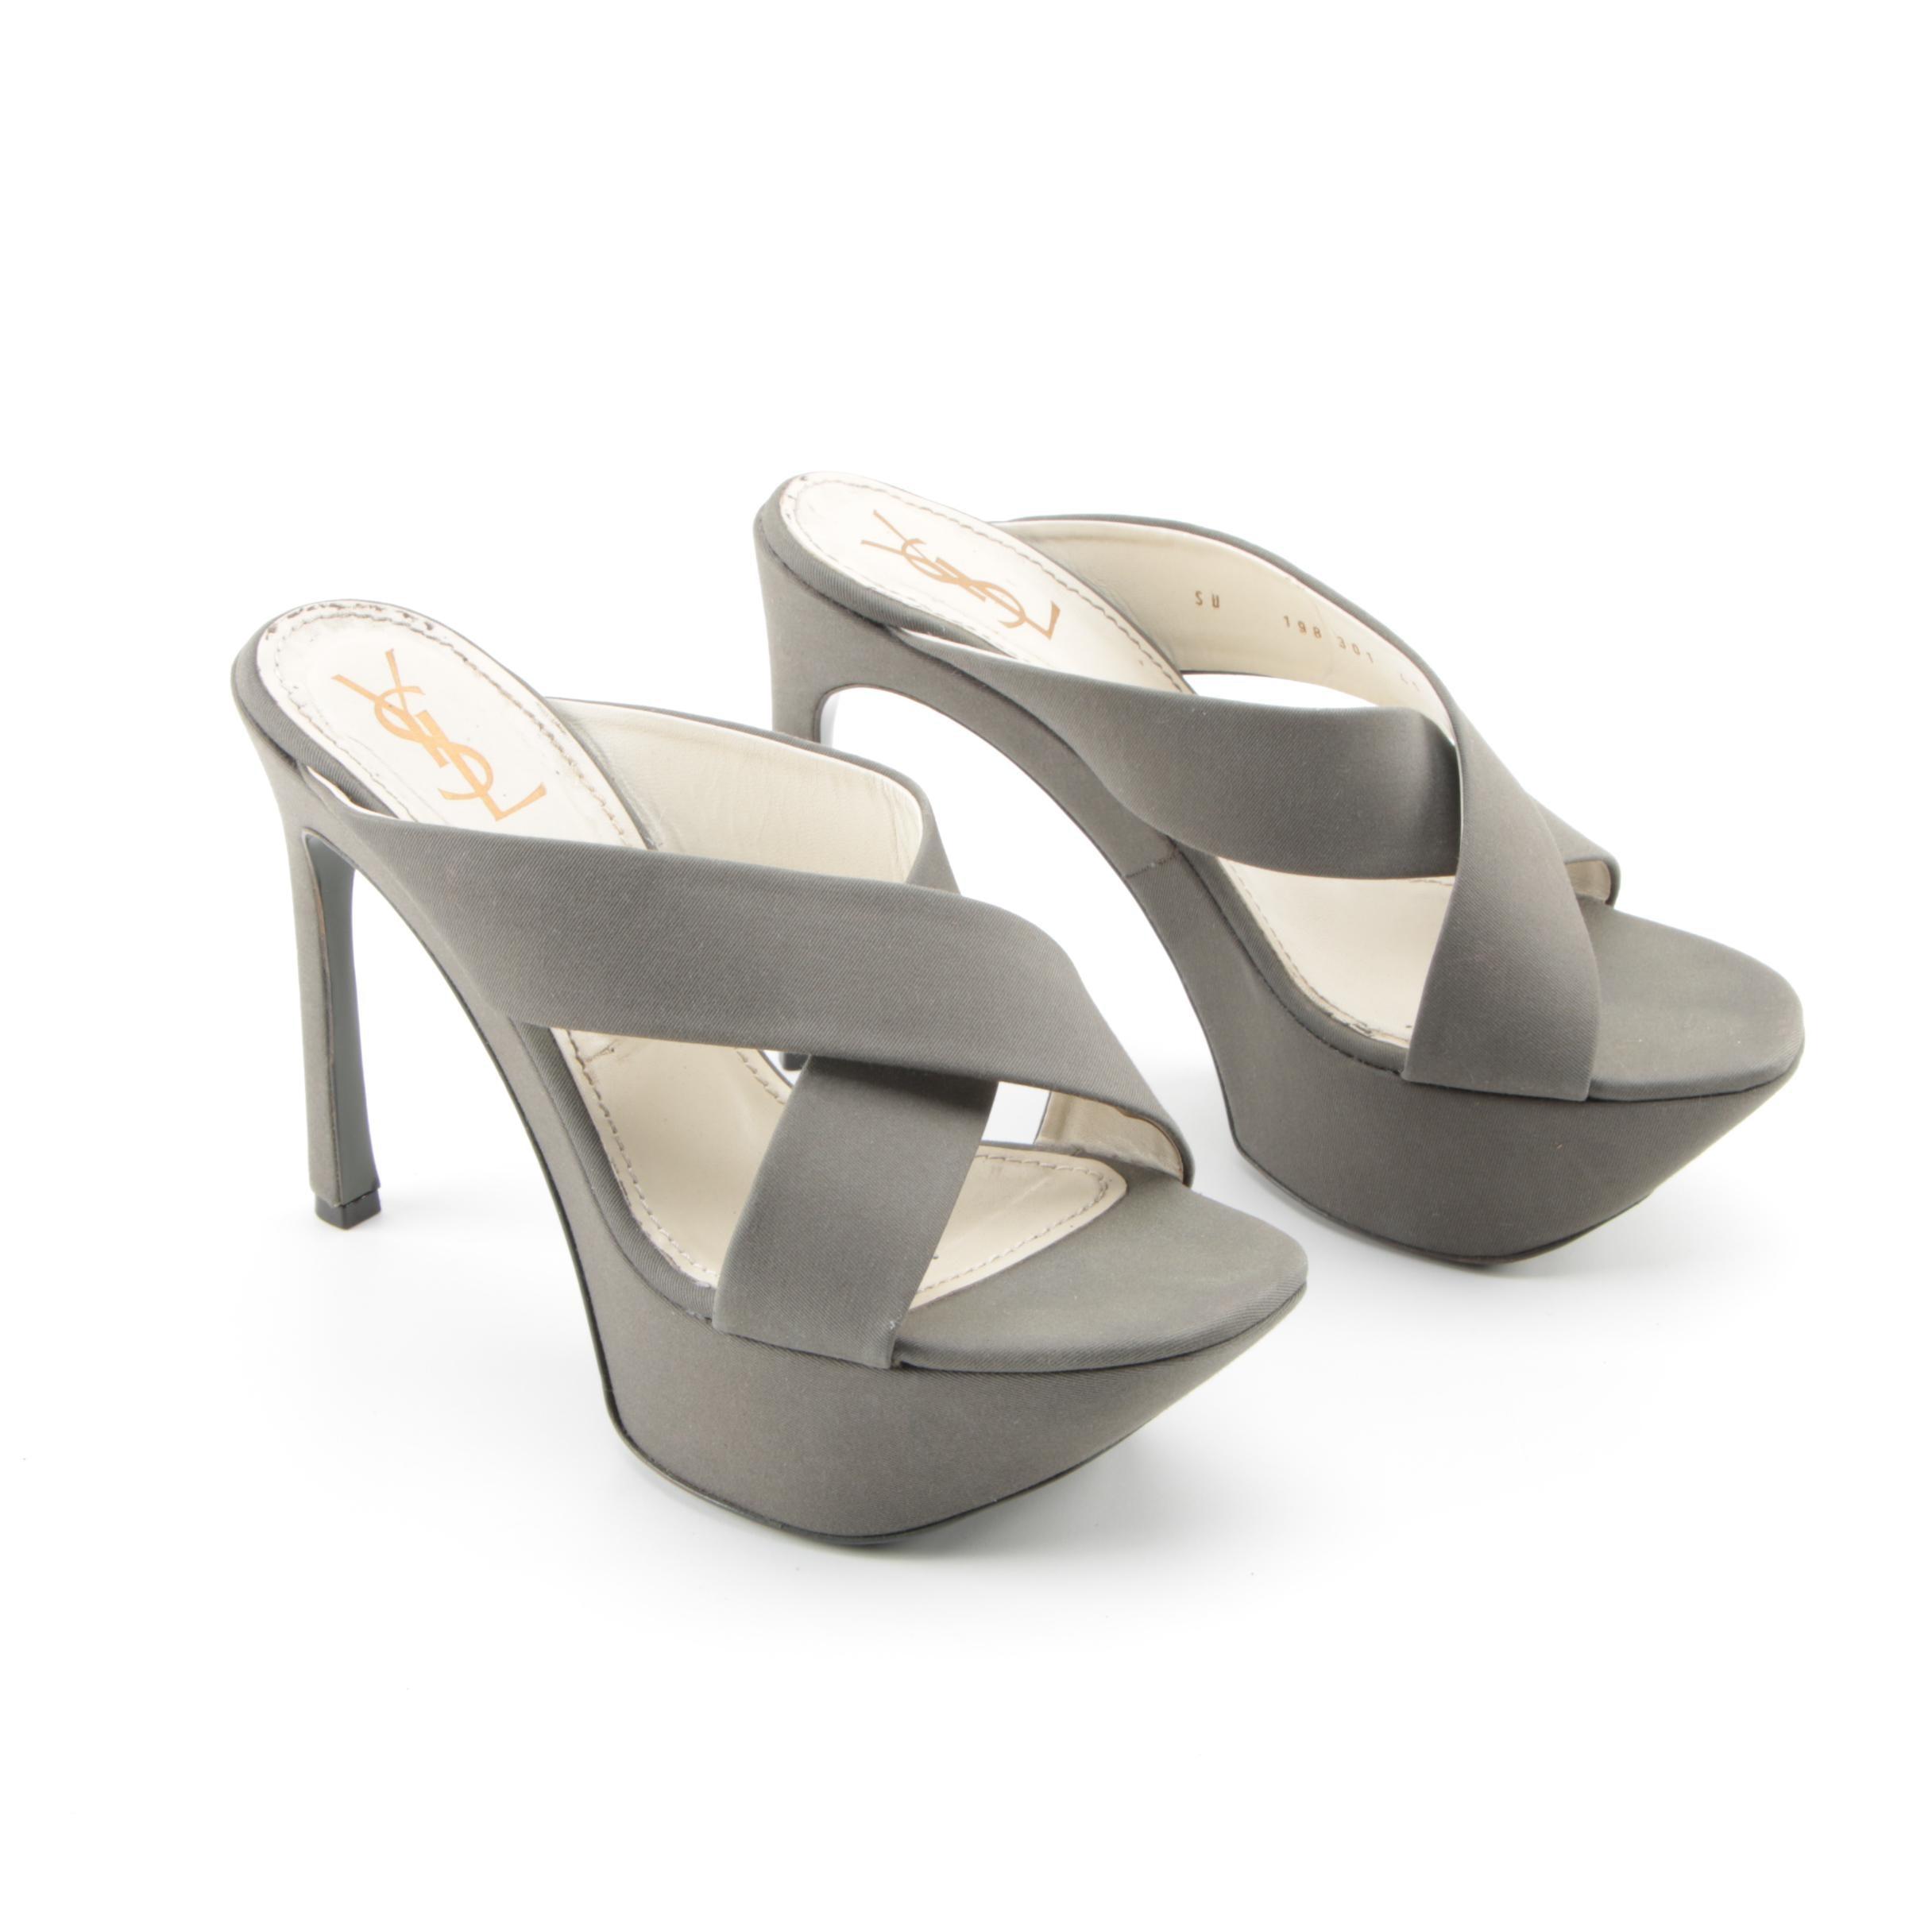 Yves Saint Laurent Suede Platform Heels